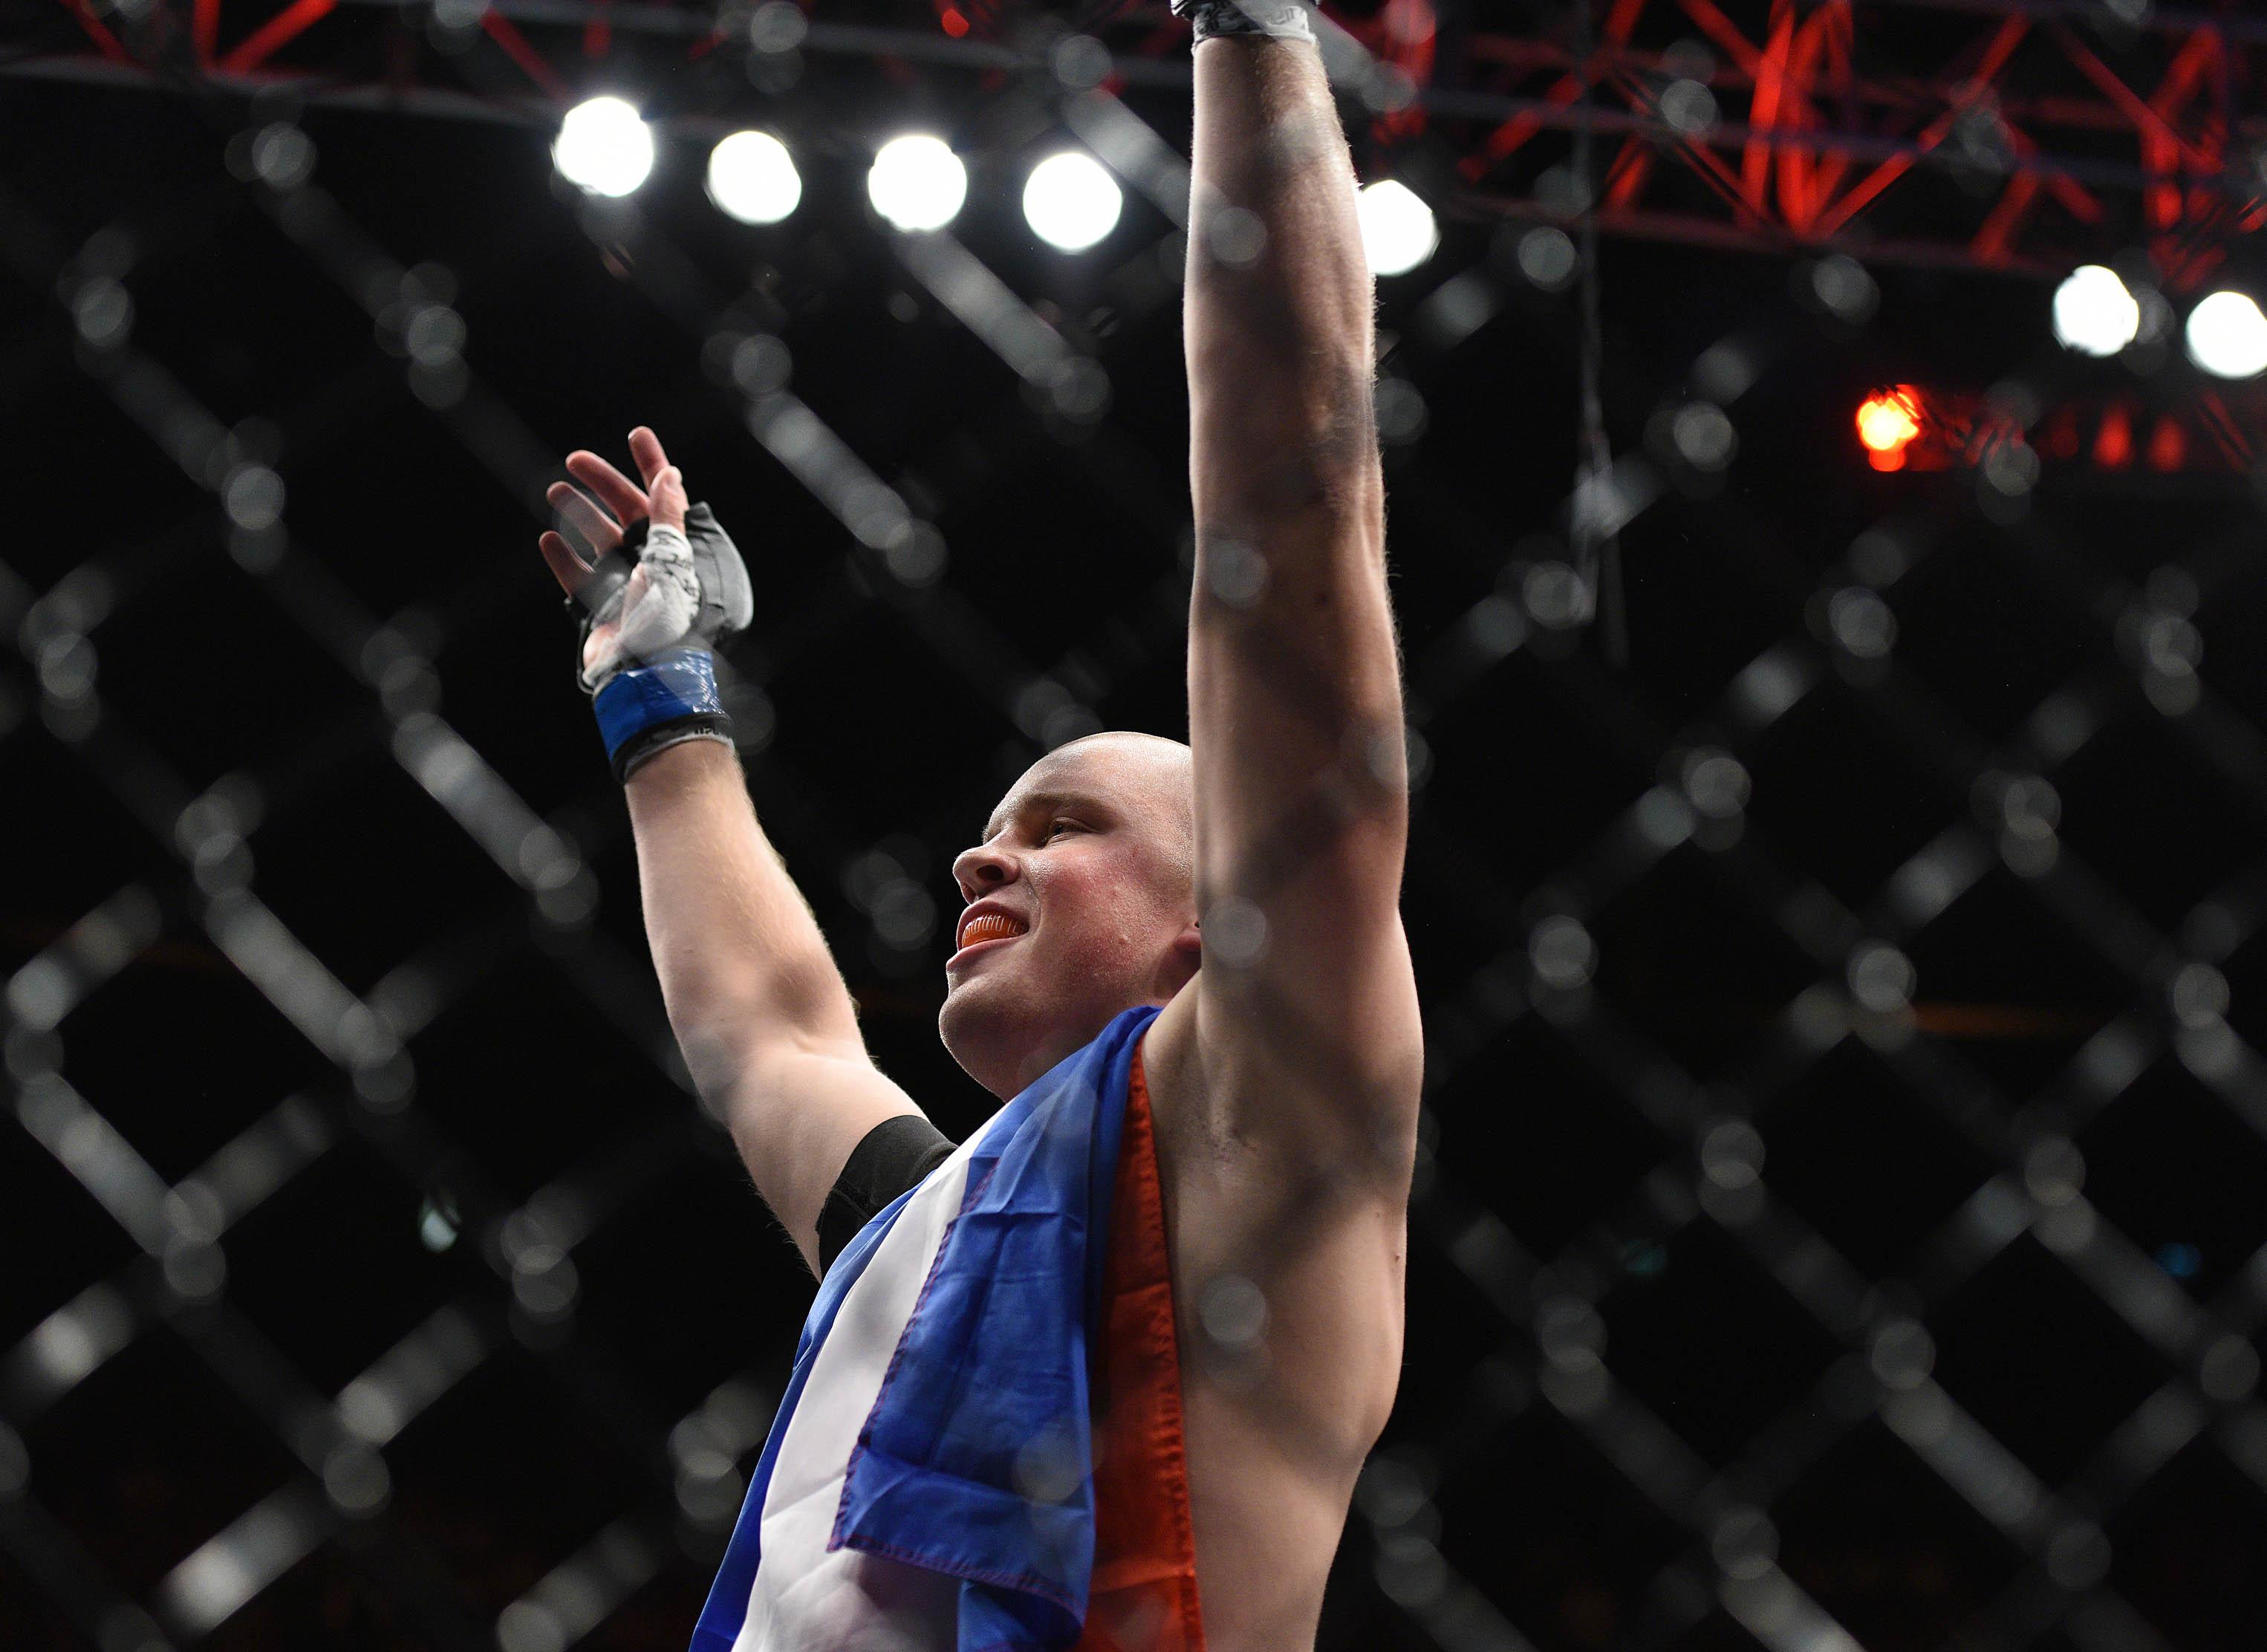 MMA: UFC Fight Night-Silva vs Struve